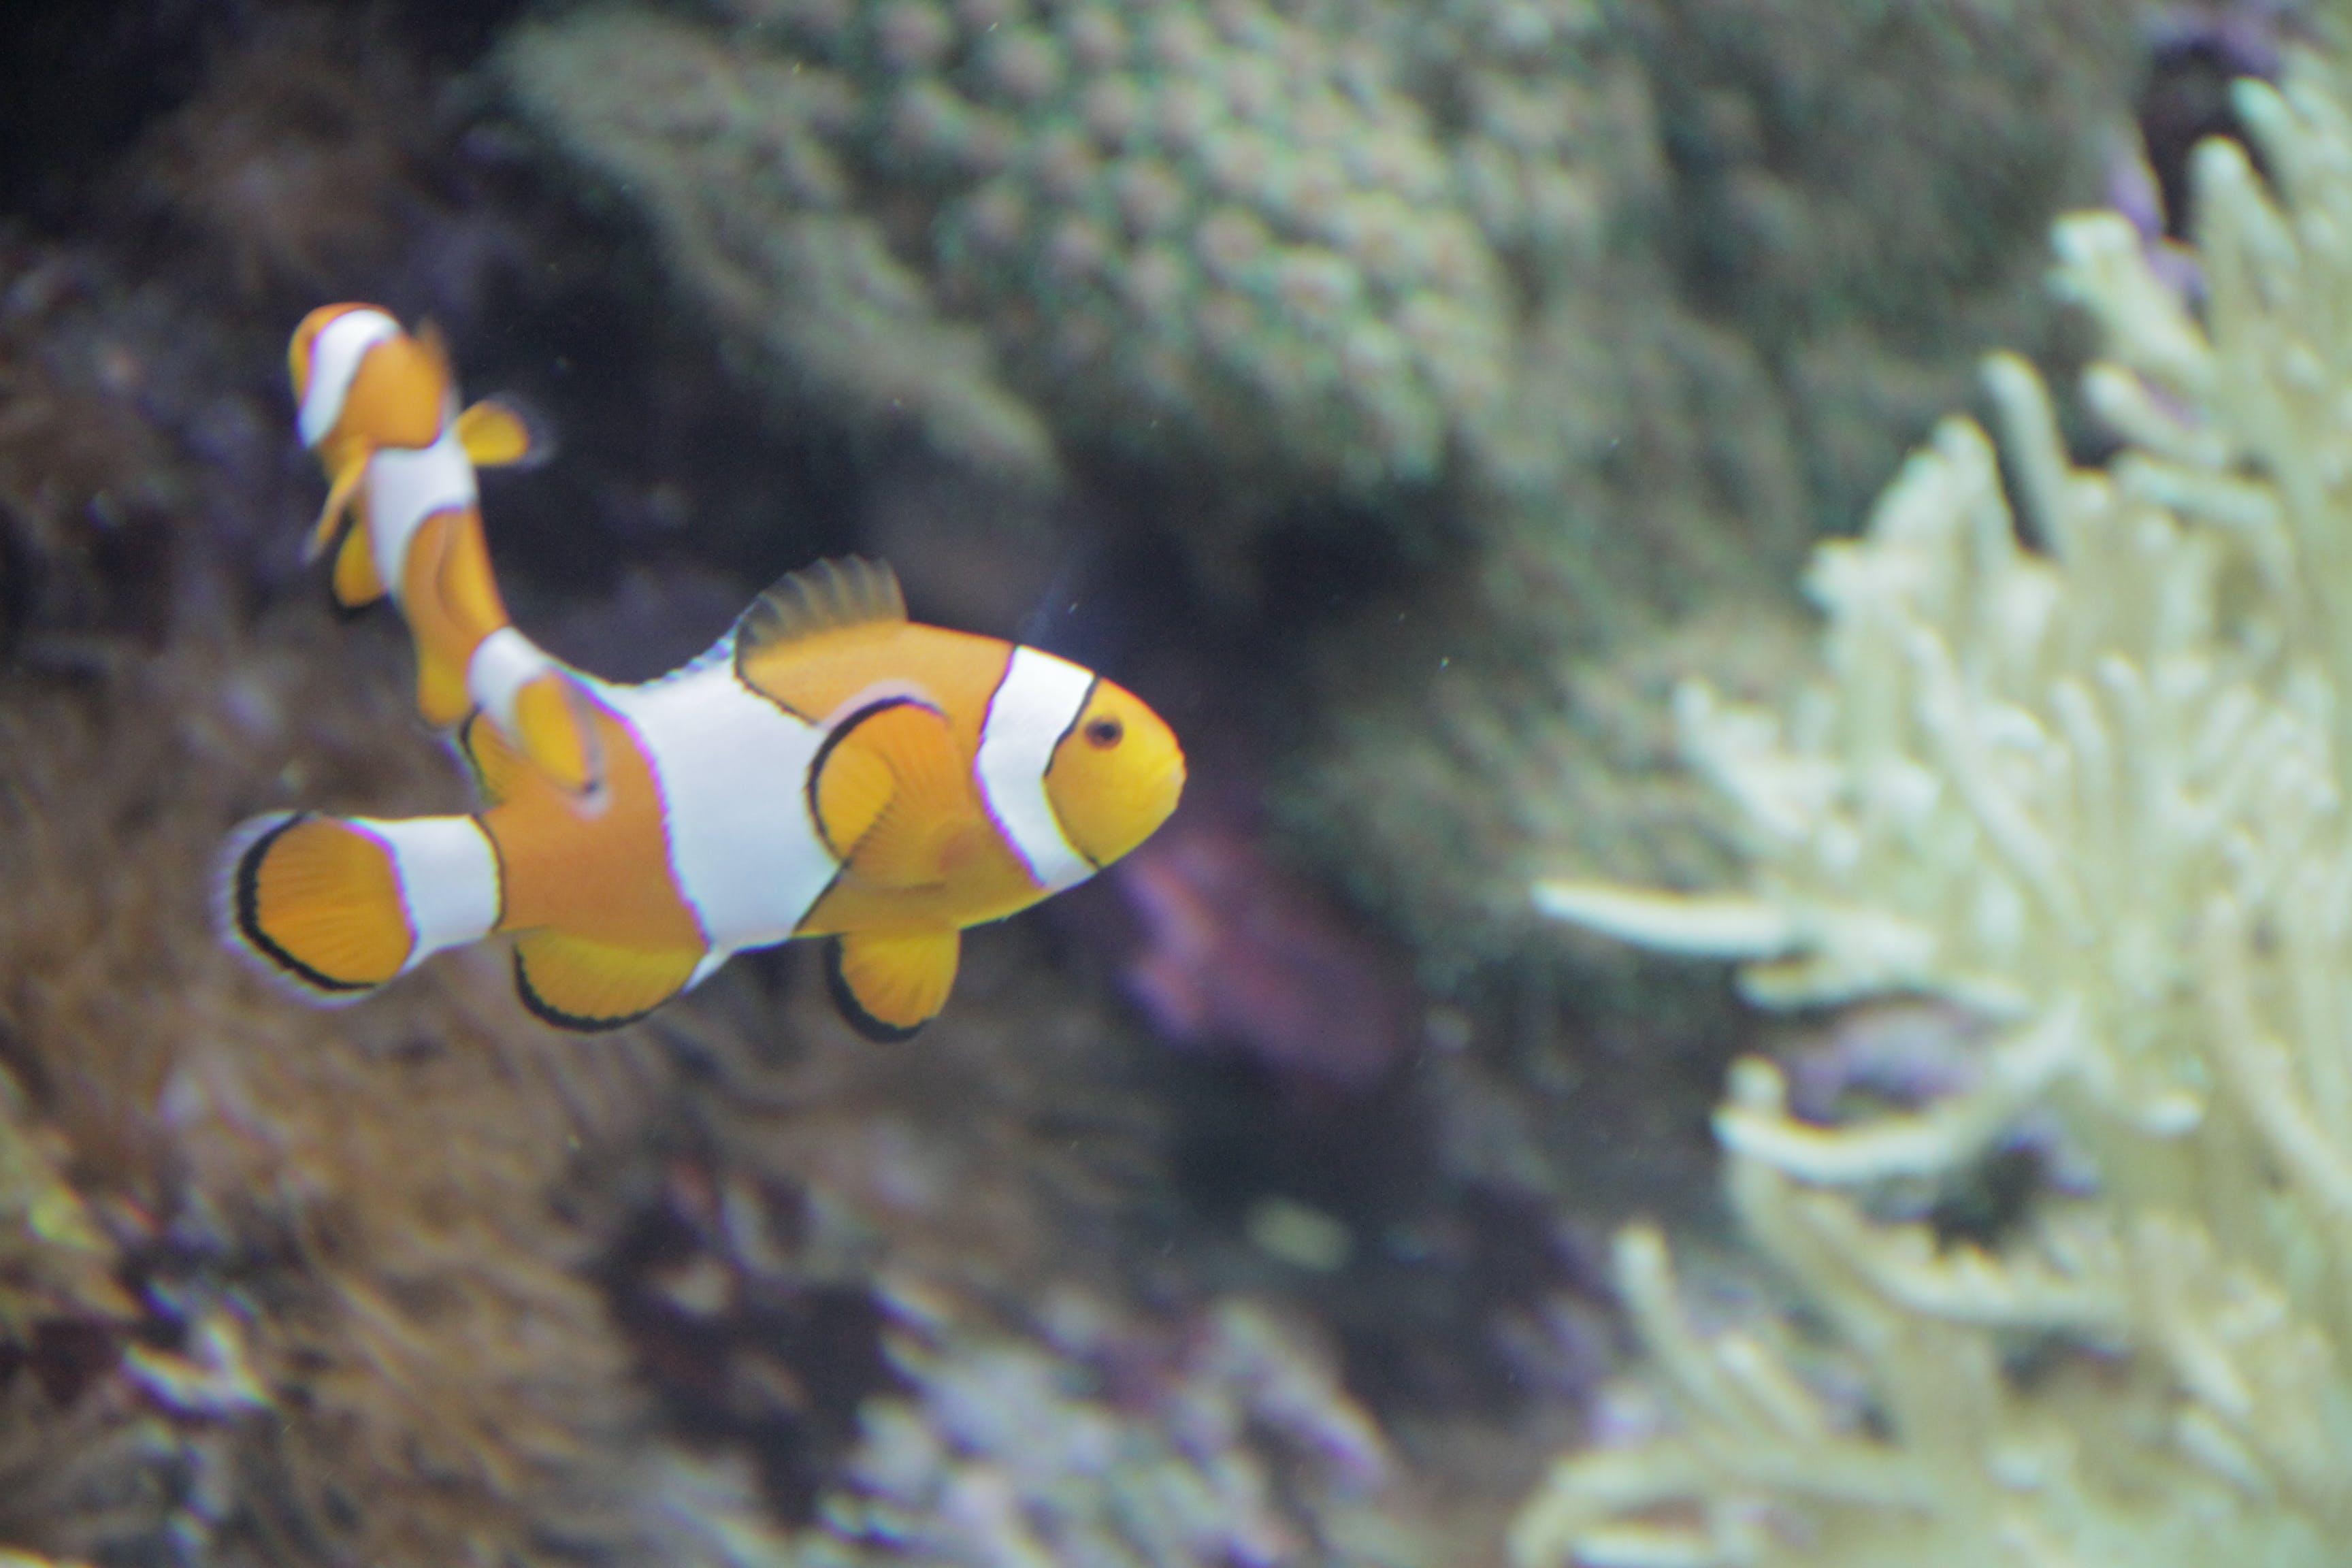 Free stock photo of Clown fish, clownfish, coral fish, fish